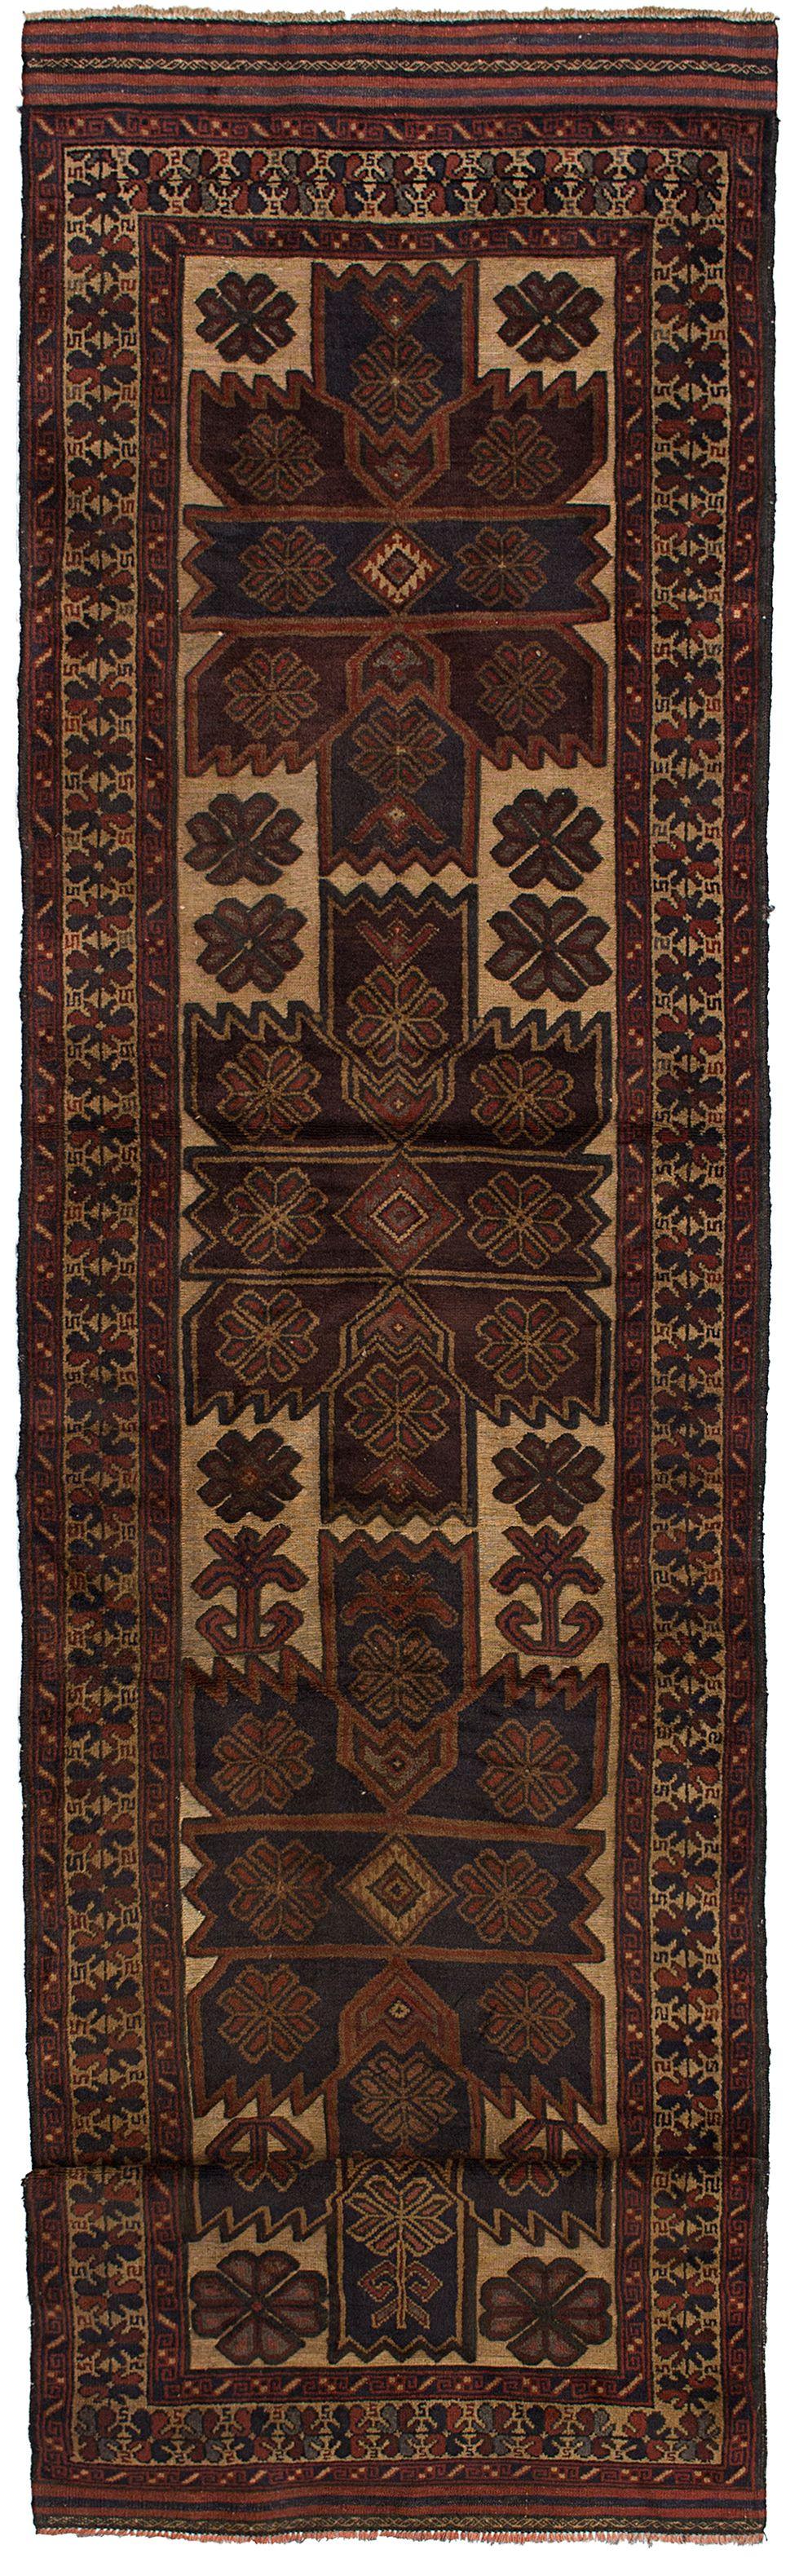 "Hand-knotted Tajik Caucasian Beige, Burgundy Wool Rug 2'9"" x 12'4"" Size: 2'9"" x 12'4"""